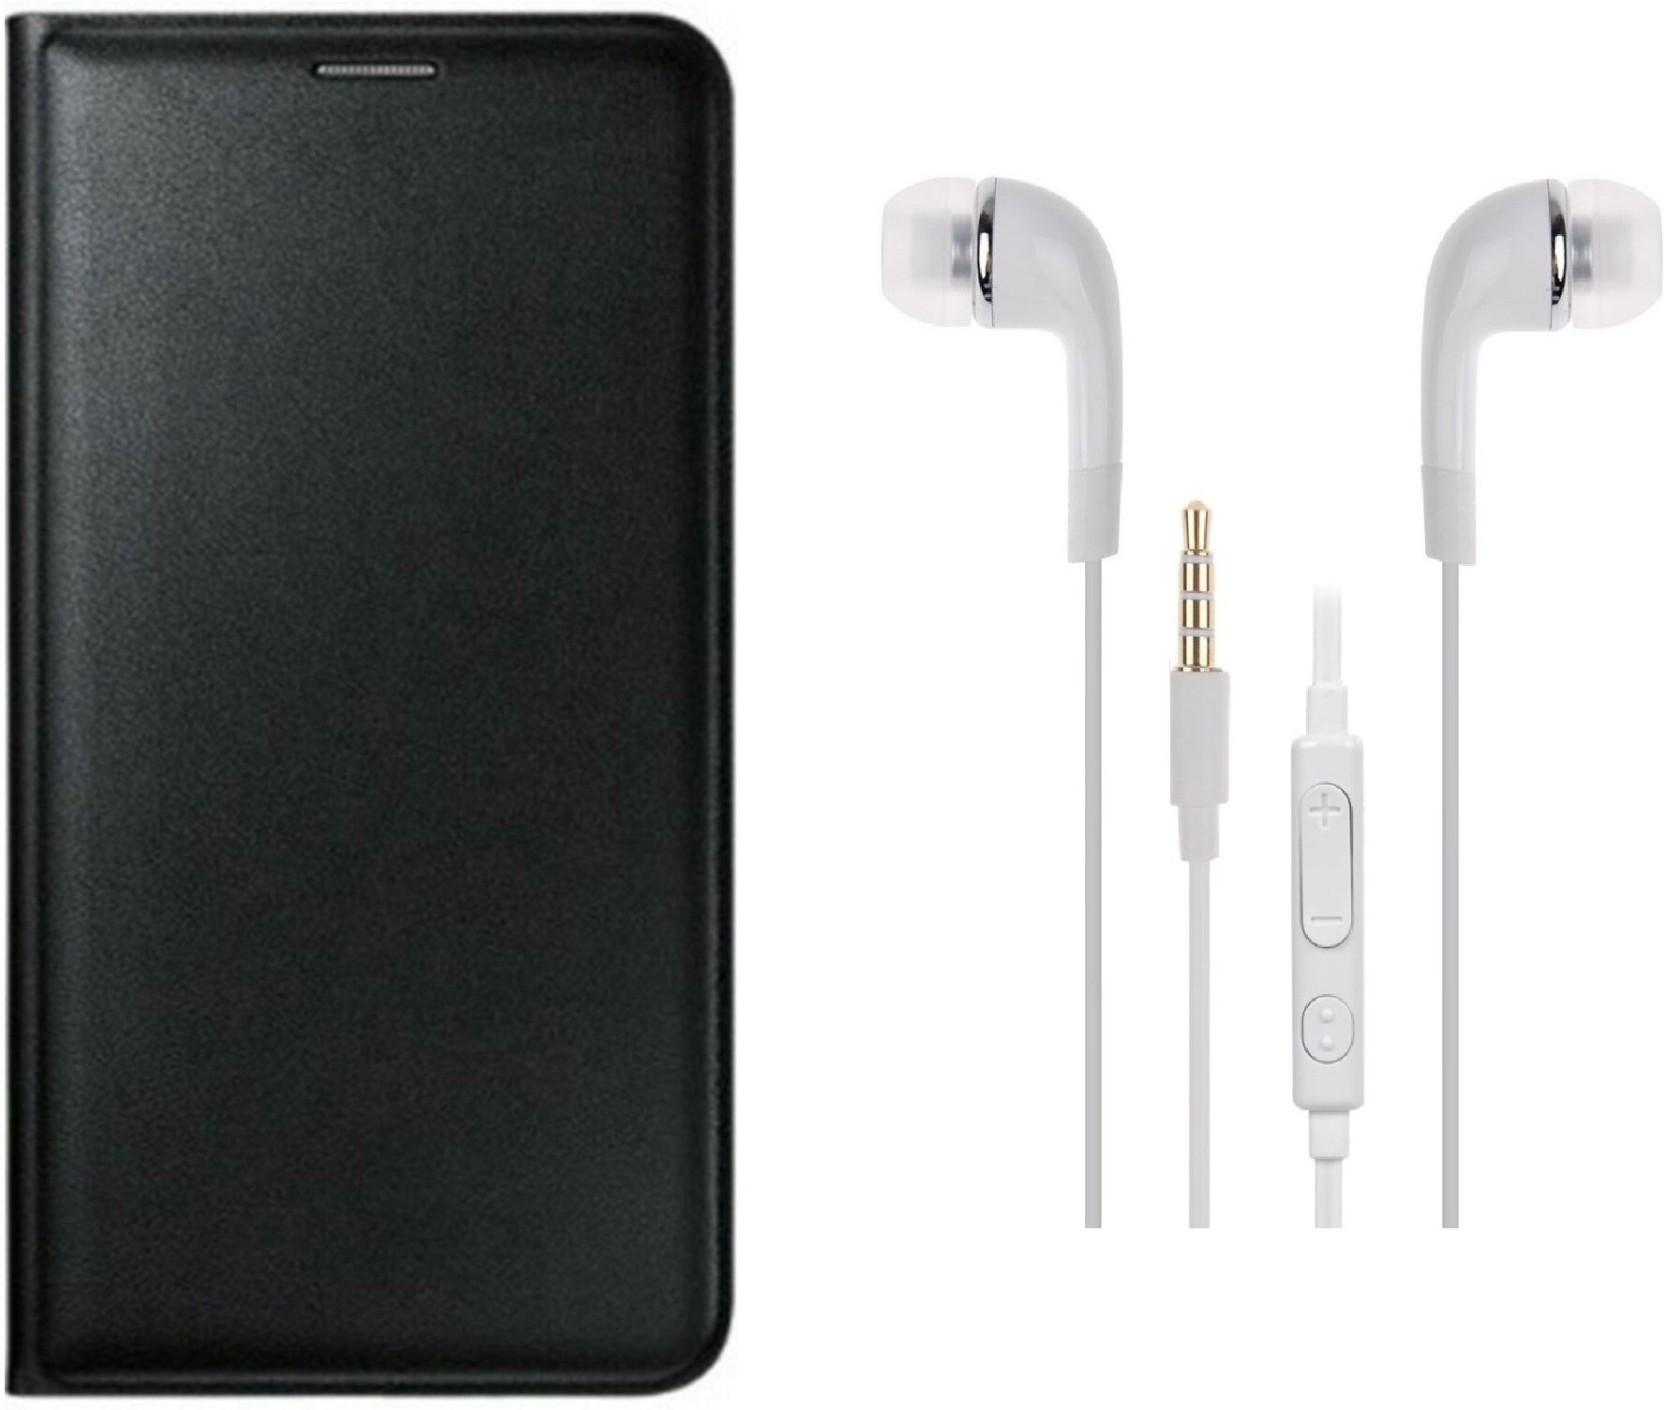 7 Case Headset Accessory Combo for Lenovo Zuk Z2 Plus (Black, White)